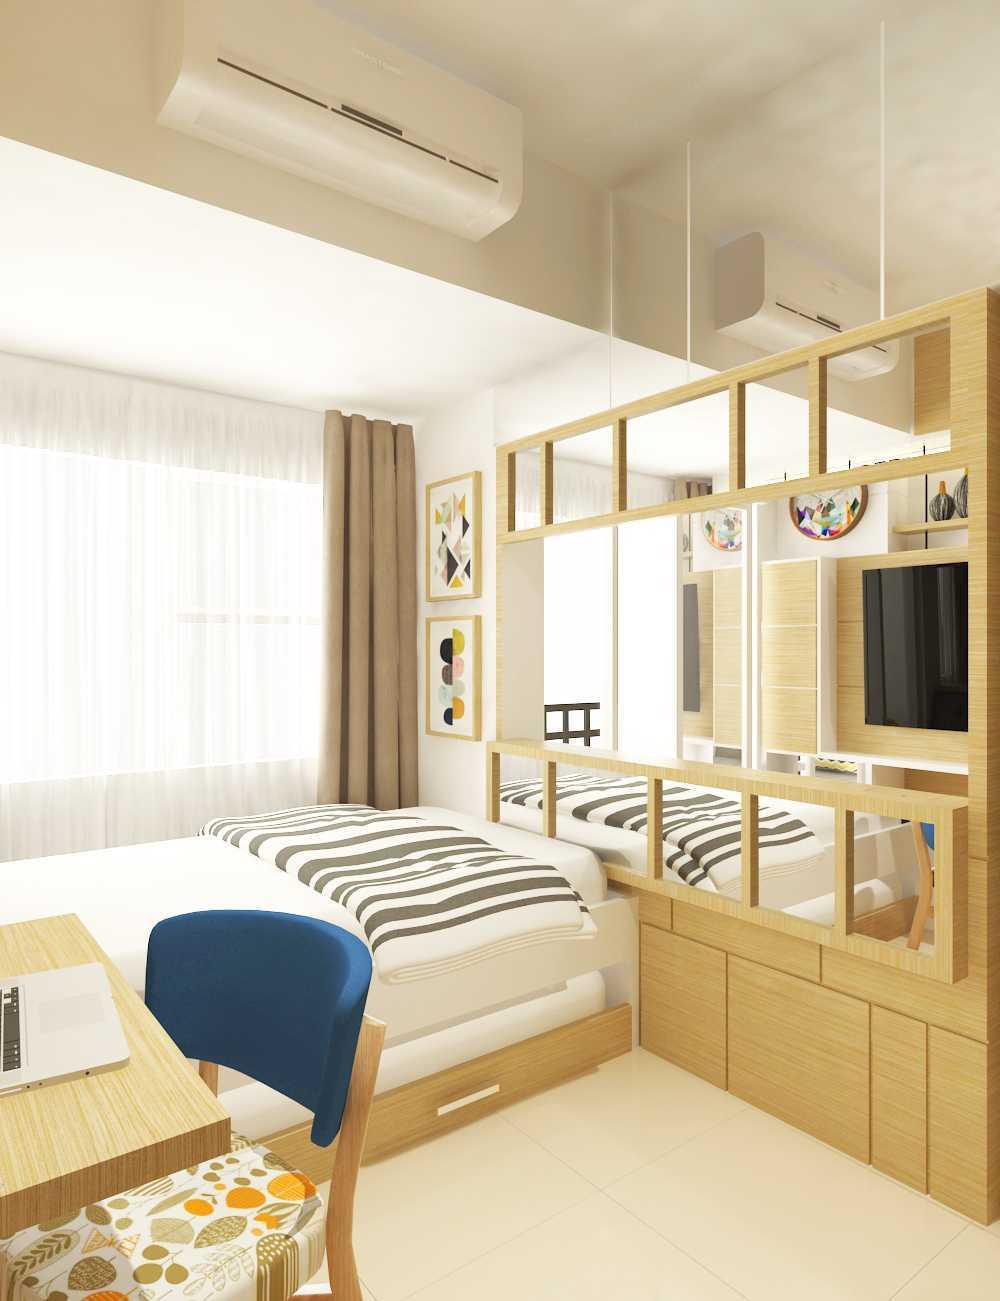 Miv Architects (Ar. Muhammad Ikhsan Hamiru, Iai & Partners) Interior Design Of Apartment Unit Makassar, South Sulawesi, Indonesia Makassar, South Sulawesi, Indonesia Apartment Room Design Skandinavia  29143